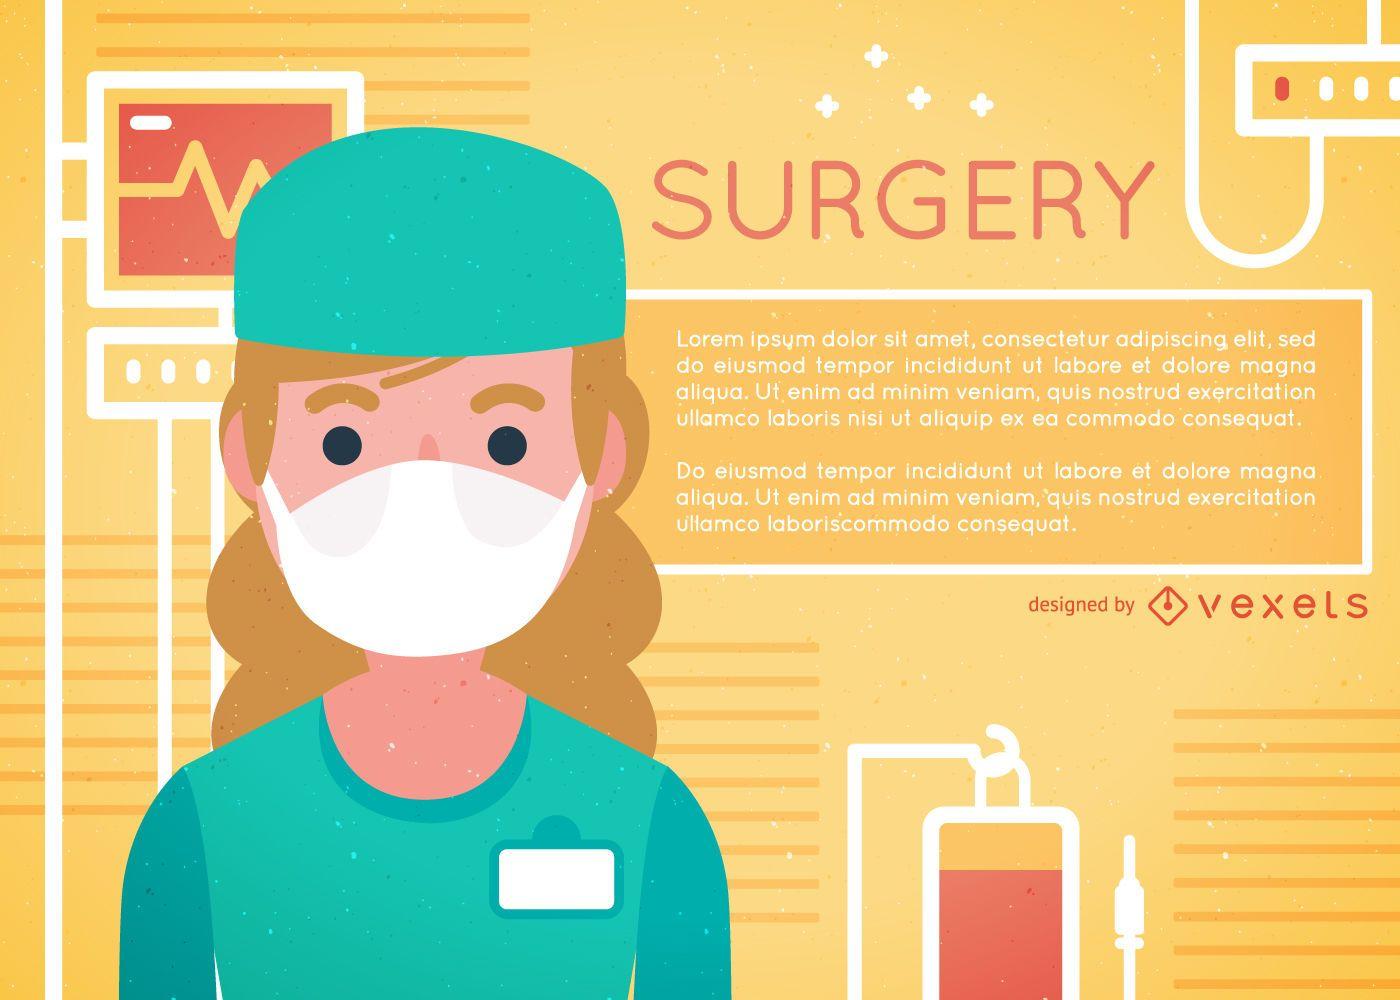 Woman surgeon illustration design